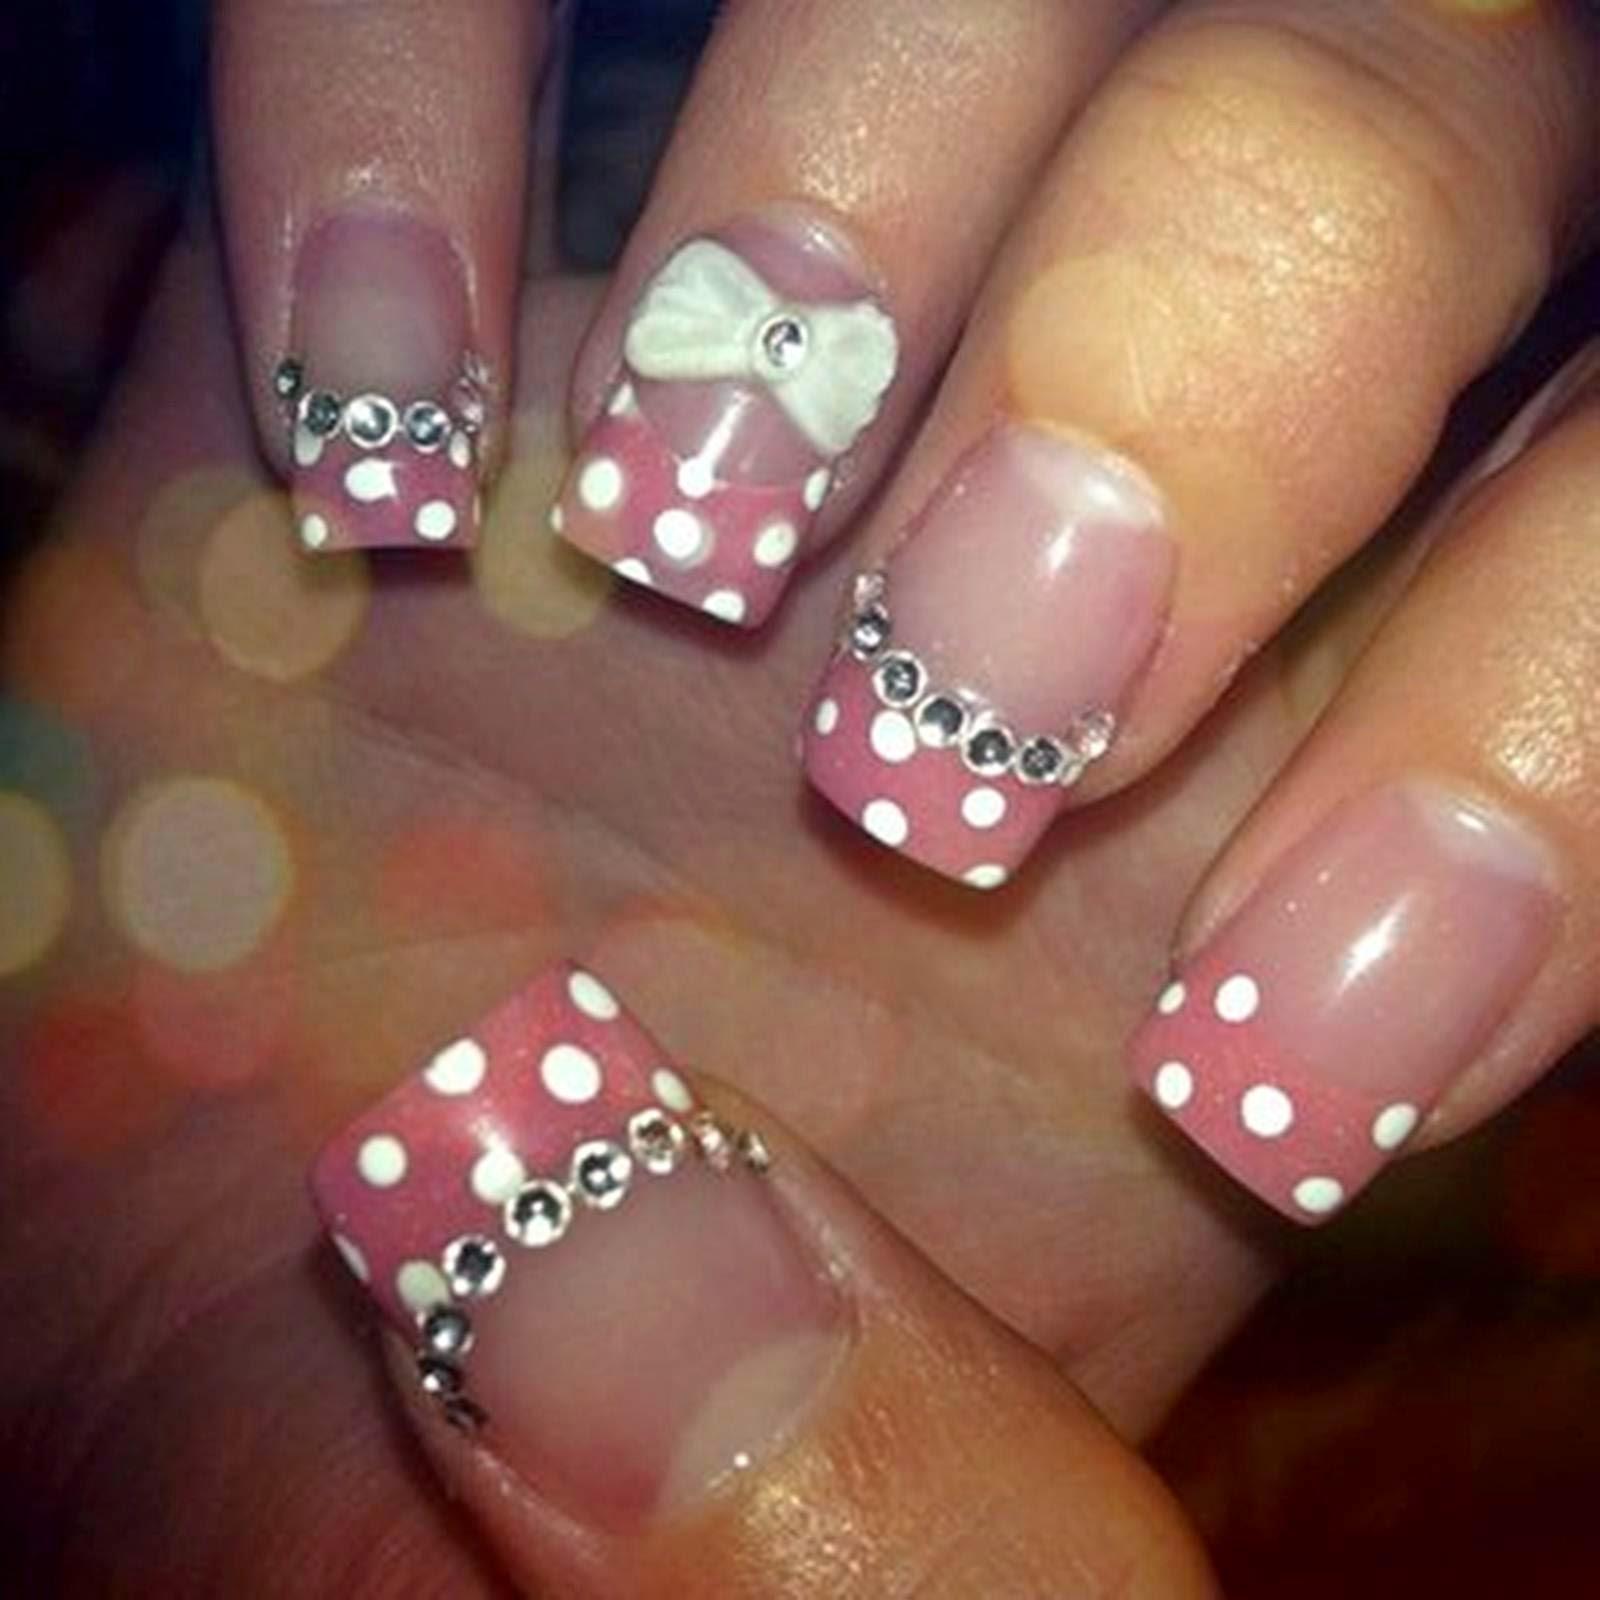 Acrylic nail designs | Nail Art and Tattoo Design Ideas ...